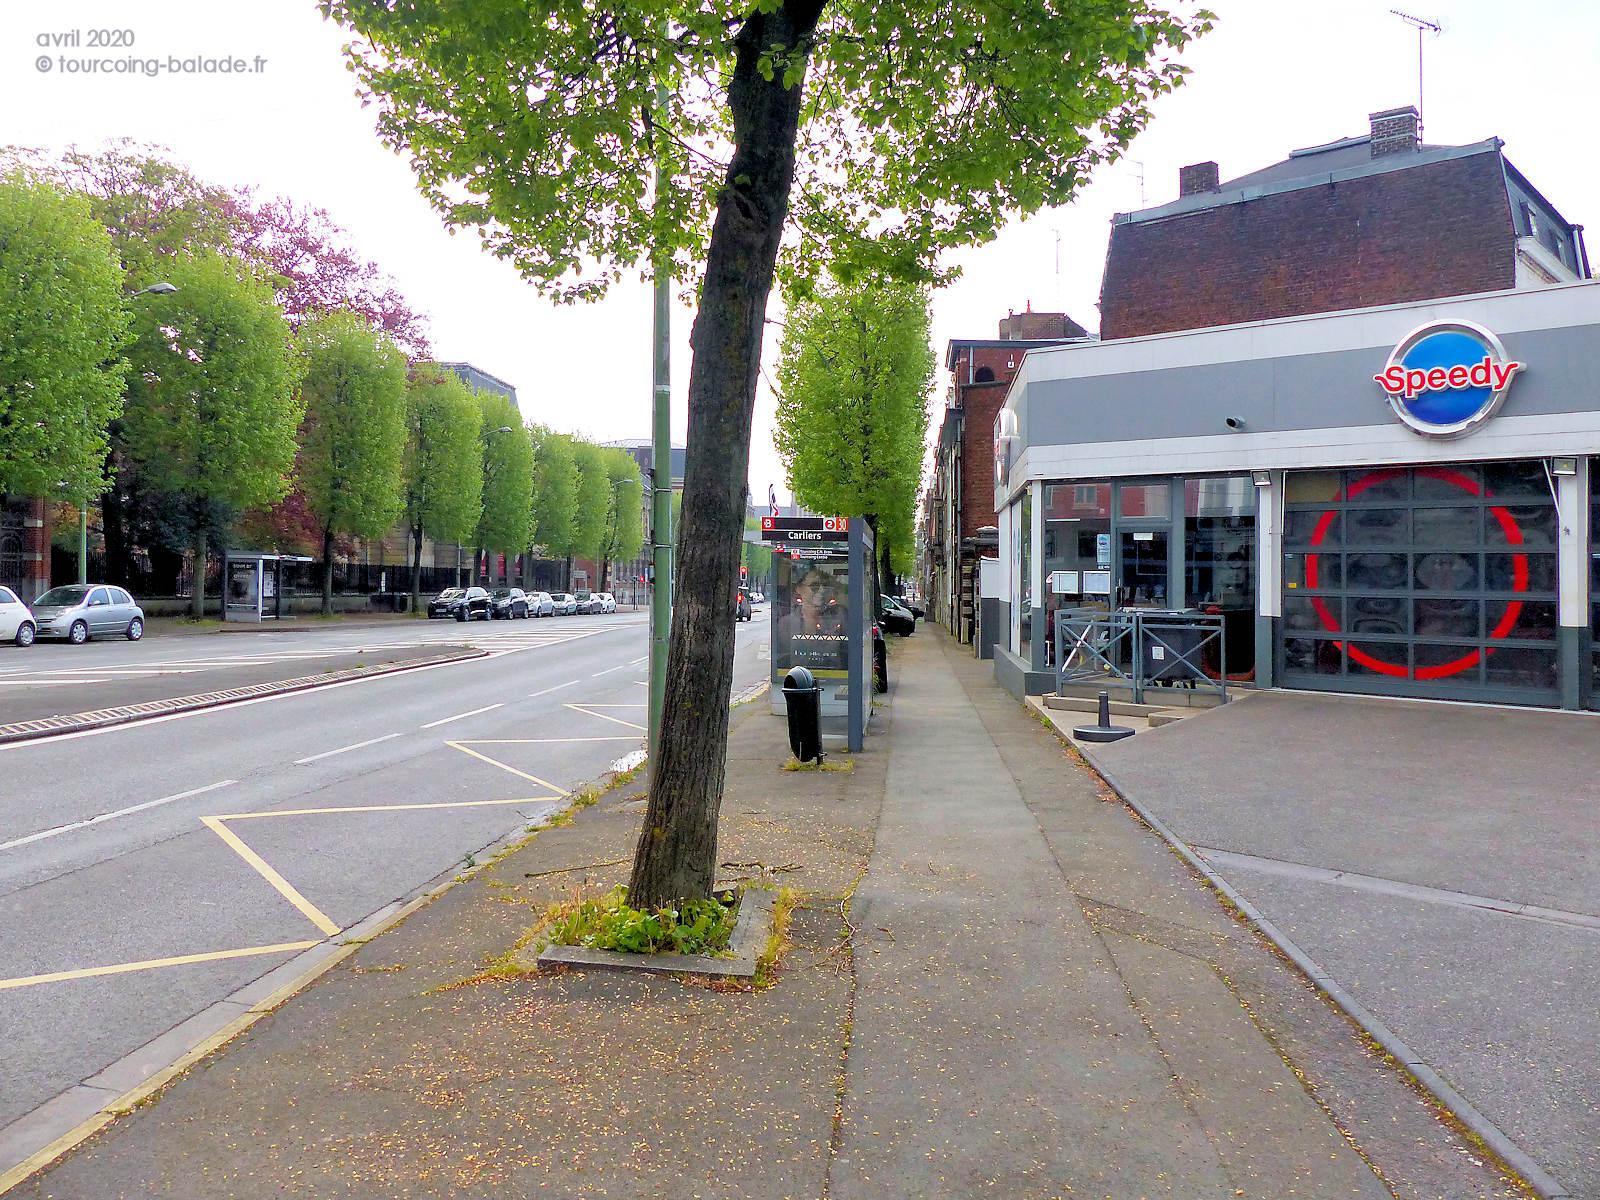 Boulevard Gambetta Tourcoing - Speedy 2020